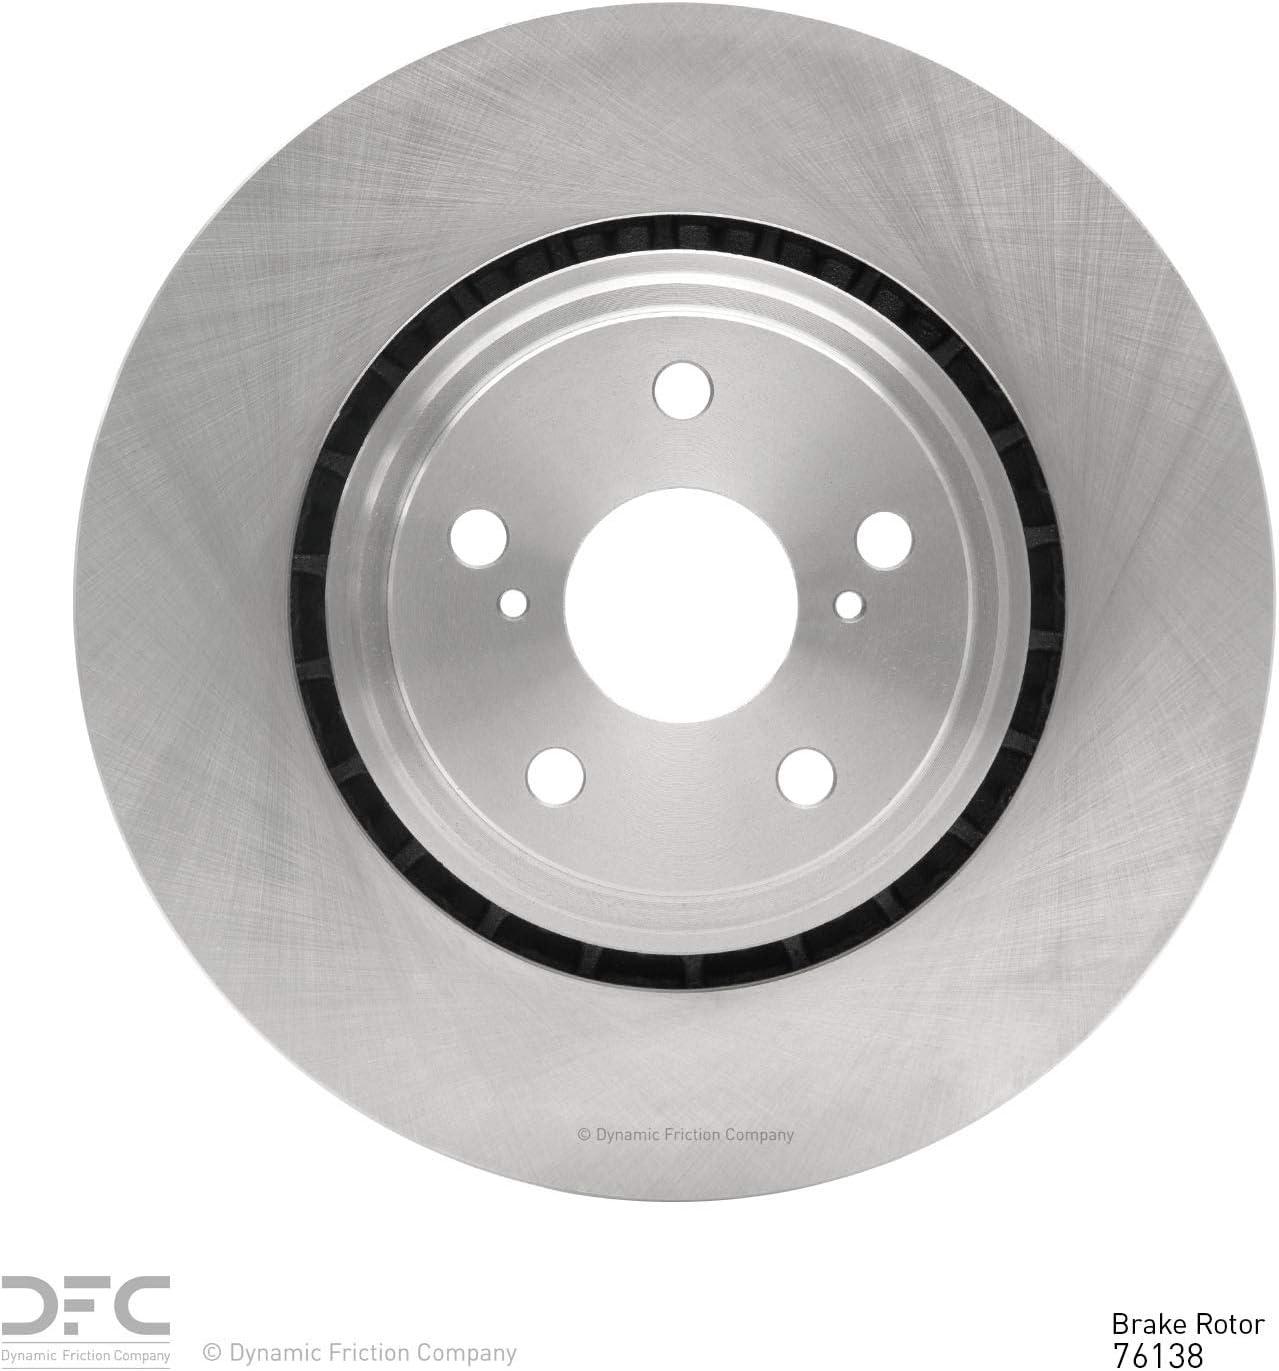 Motorcycle & ATV 1 Front Dynamic Friction Company Disc Brake Rotor ...